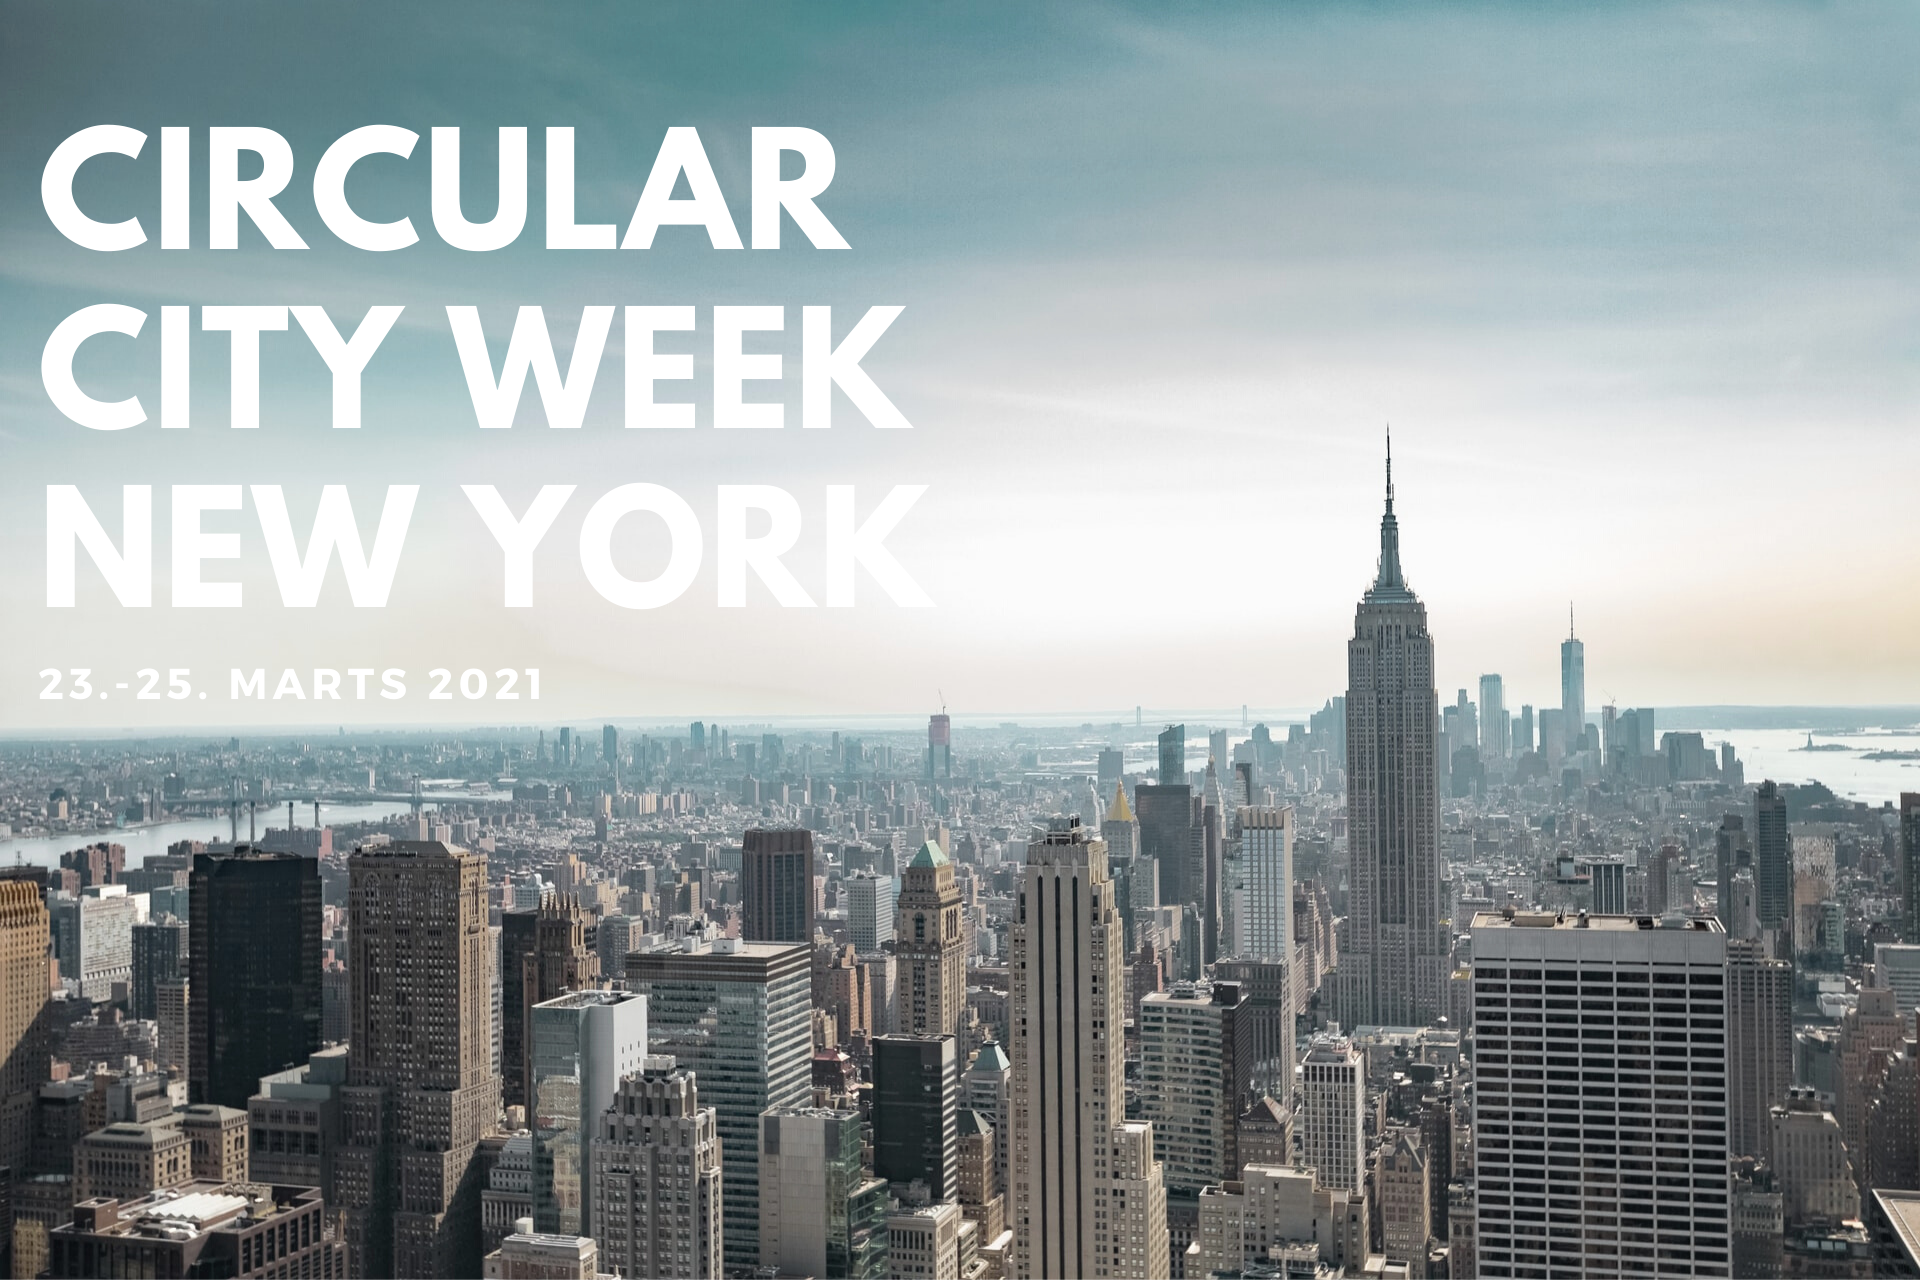 Circular City Week New York